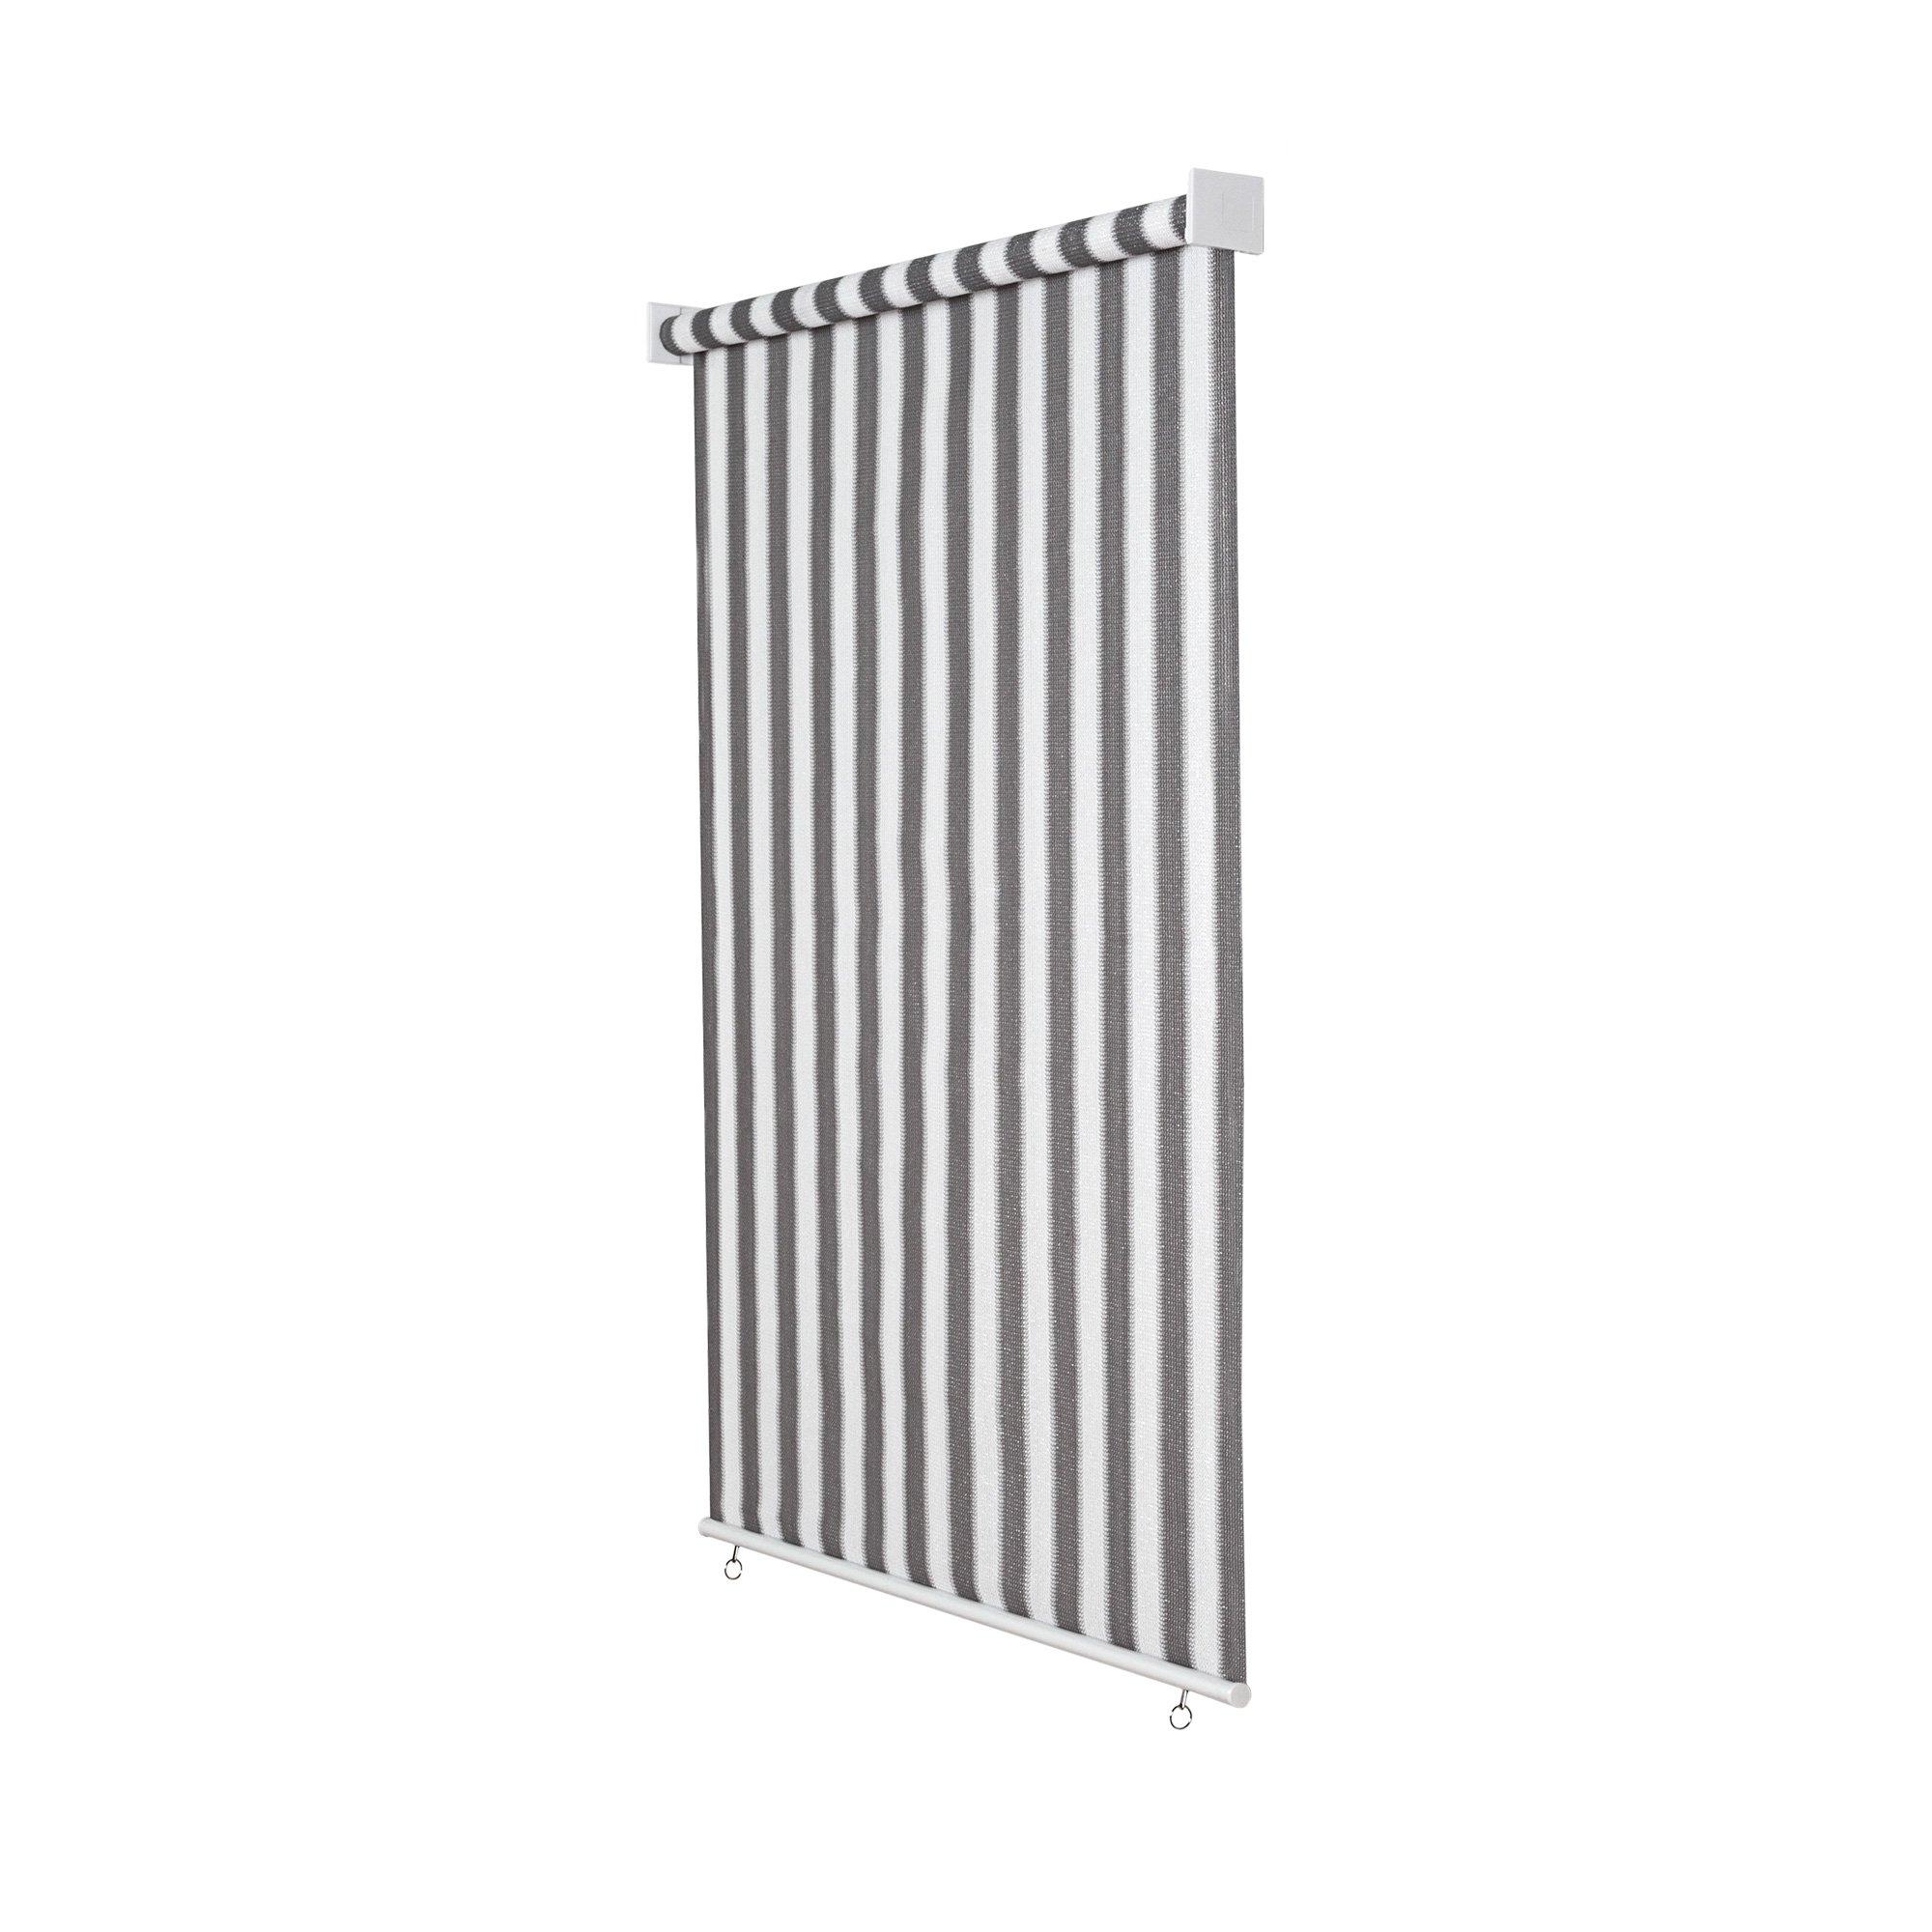 jarolift Estor Exterior/Persiana Exterior/Toldo Vertical, 180 x 140 cm(Ancho x Altura) Gris/Blanco: Amazon.es: Hogar